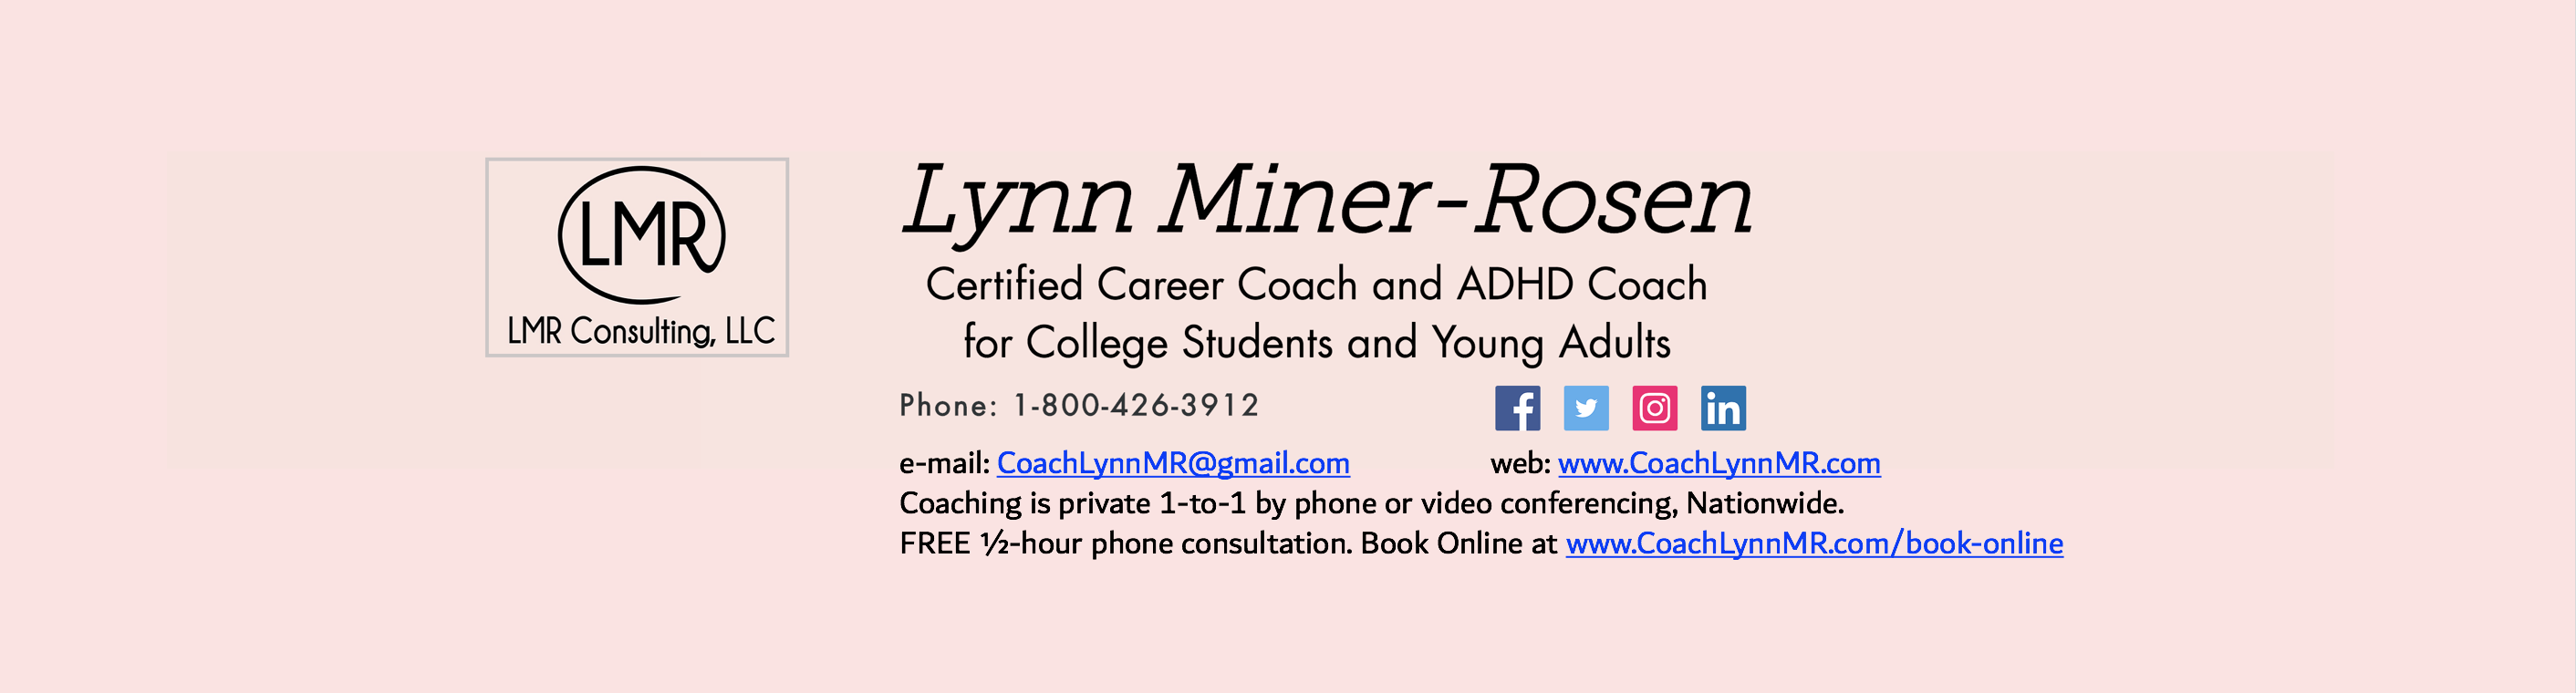 Adhd Coach Career Development Coach Nationwide Lmr Coaching Llc